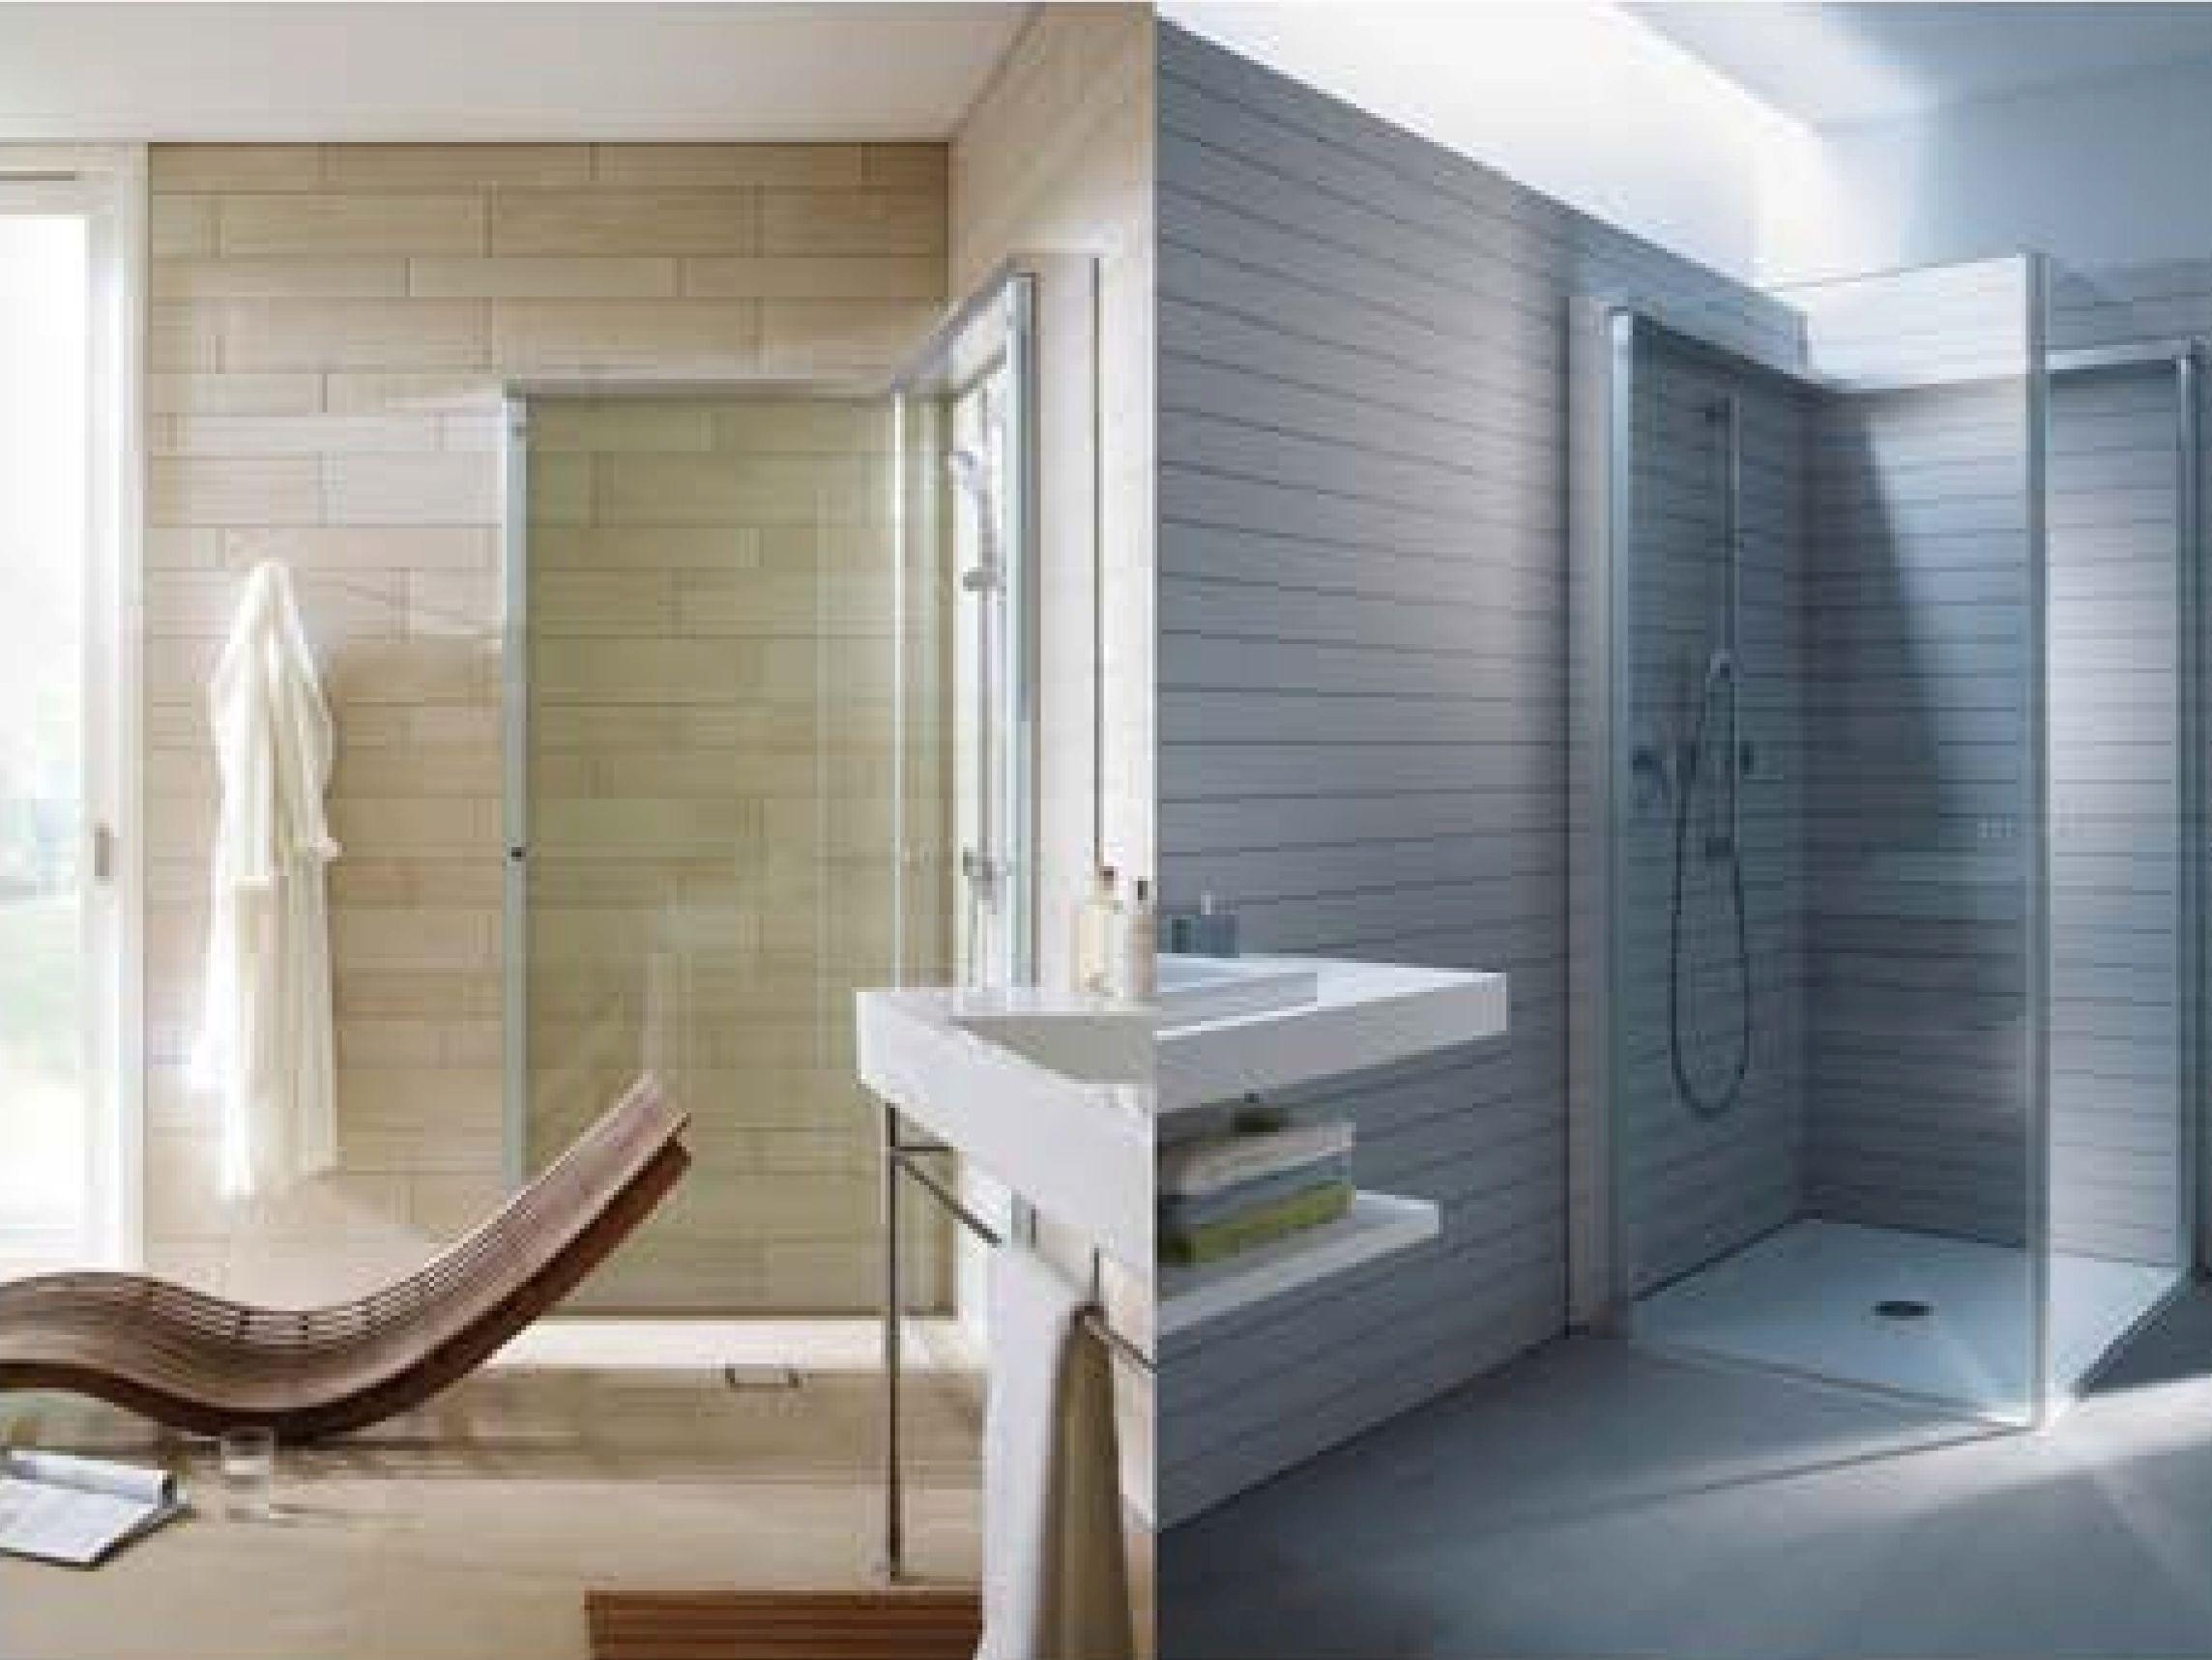 Fold Up Shower space saving shower stall | b r nelson designs llc